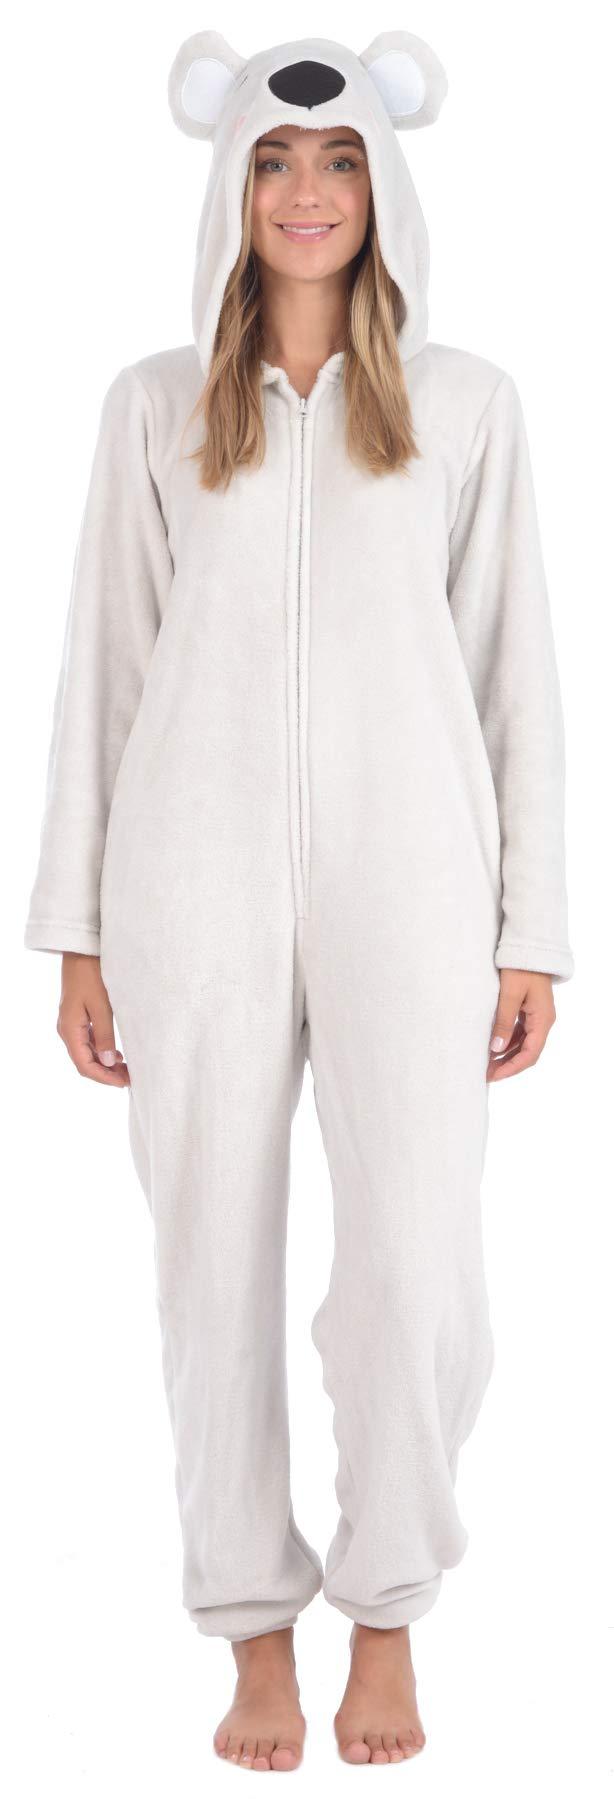 Body Candy Women's Plush Adult Animal Hood Onesie Pajama (Koala, X-Large) by Body Candy Loungewear